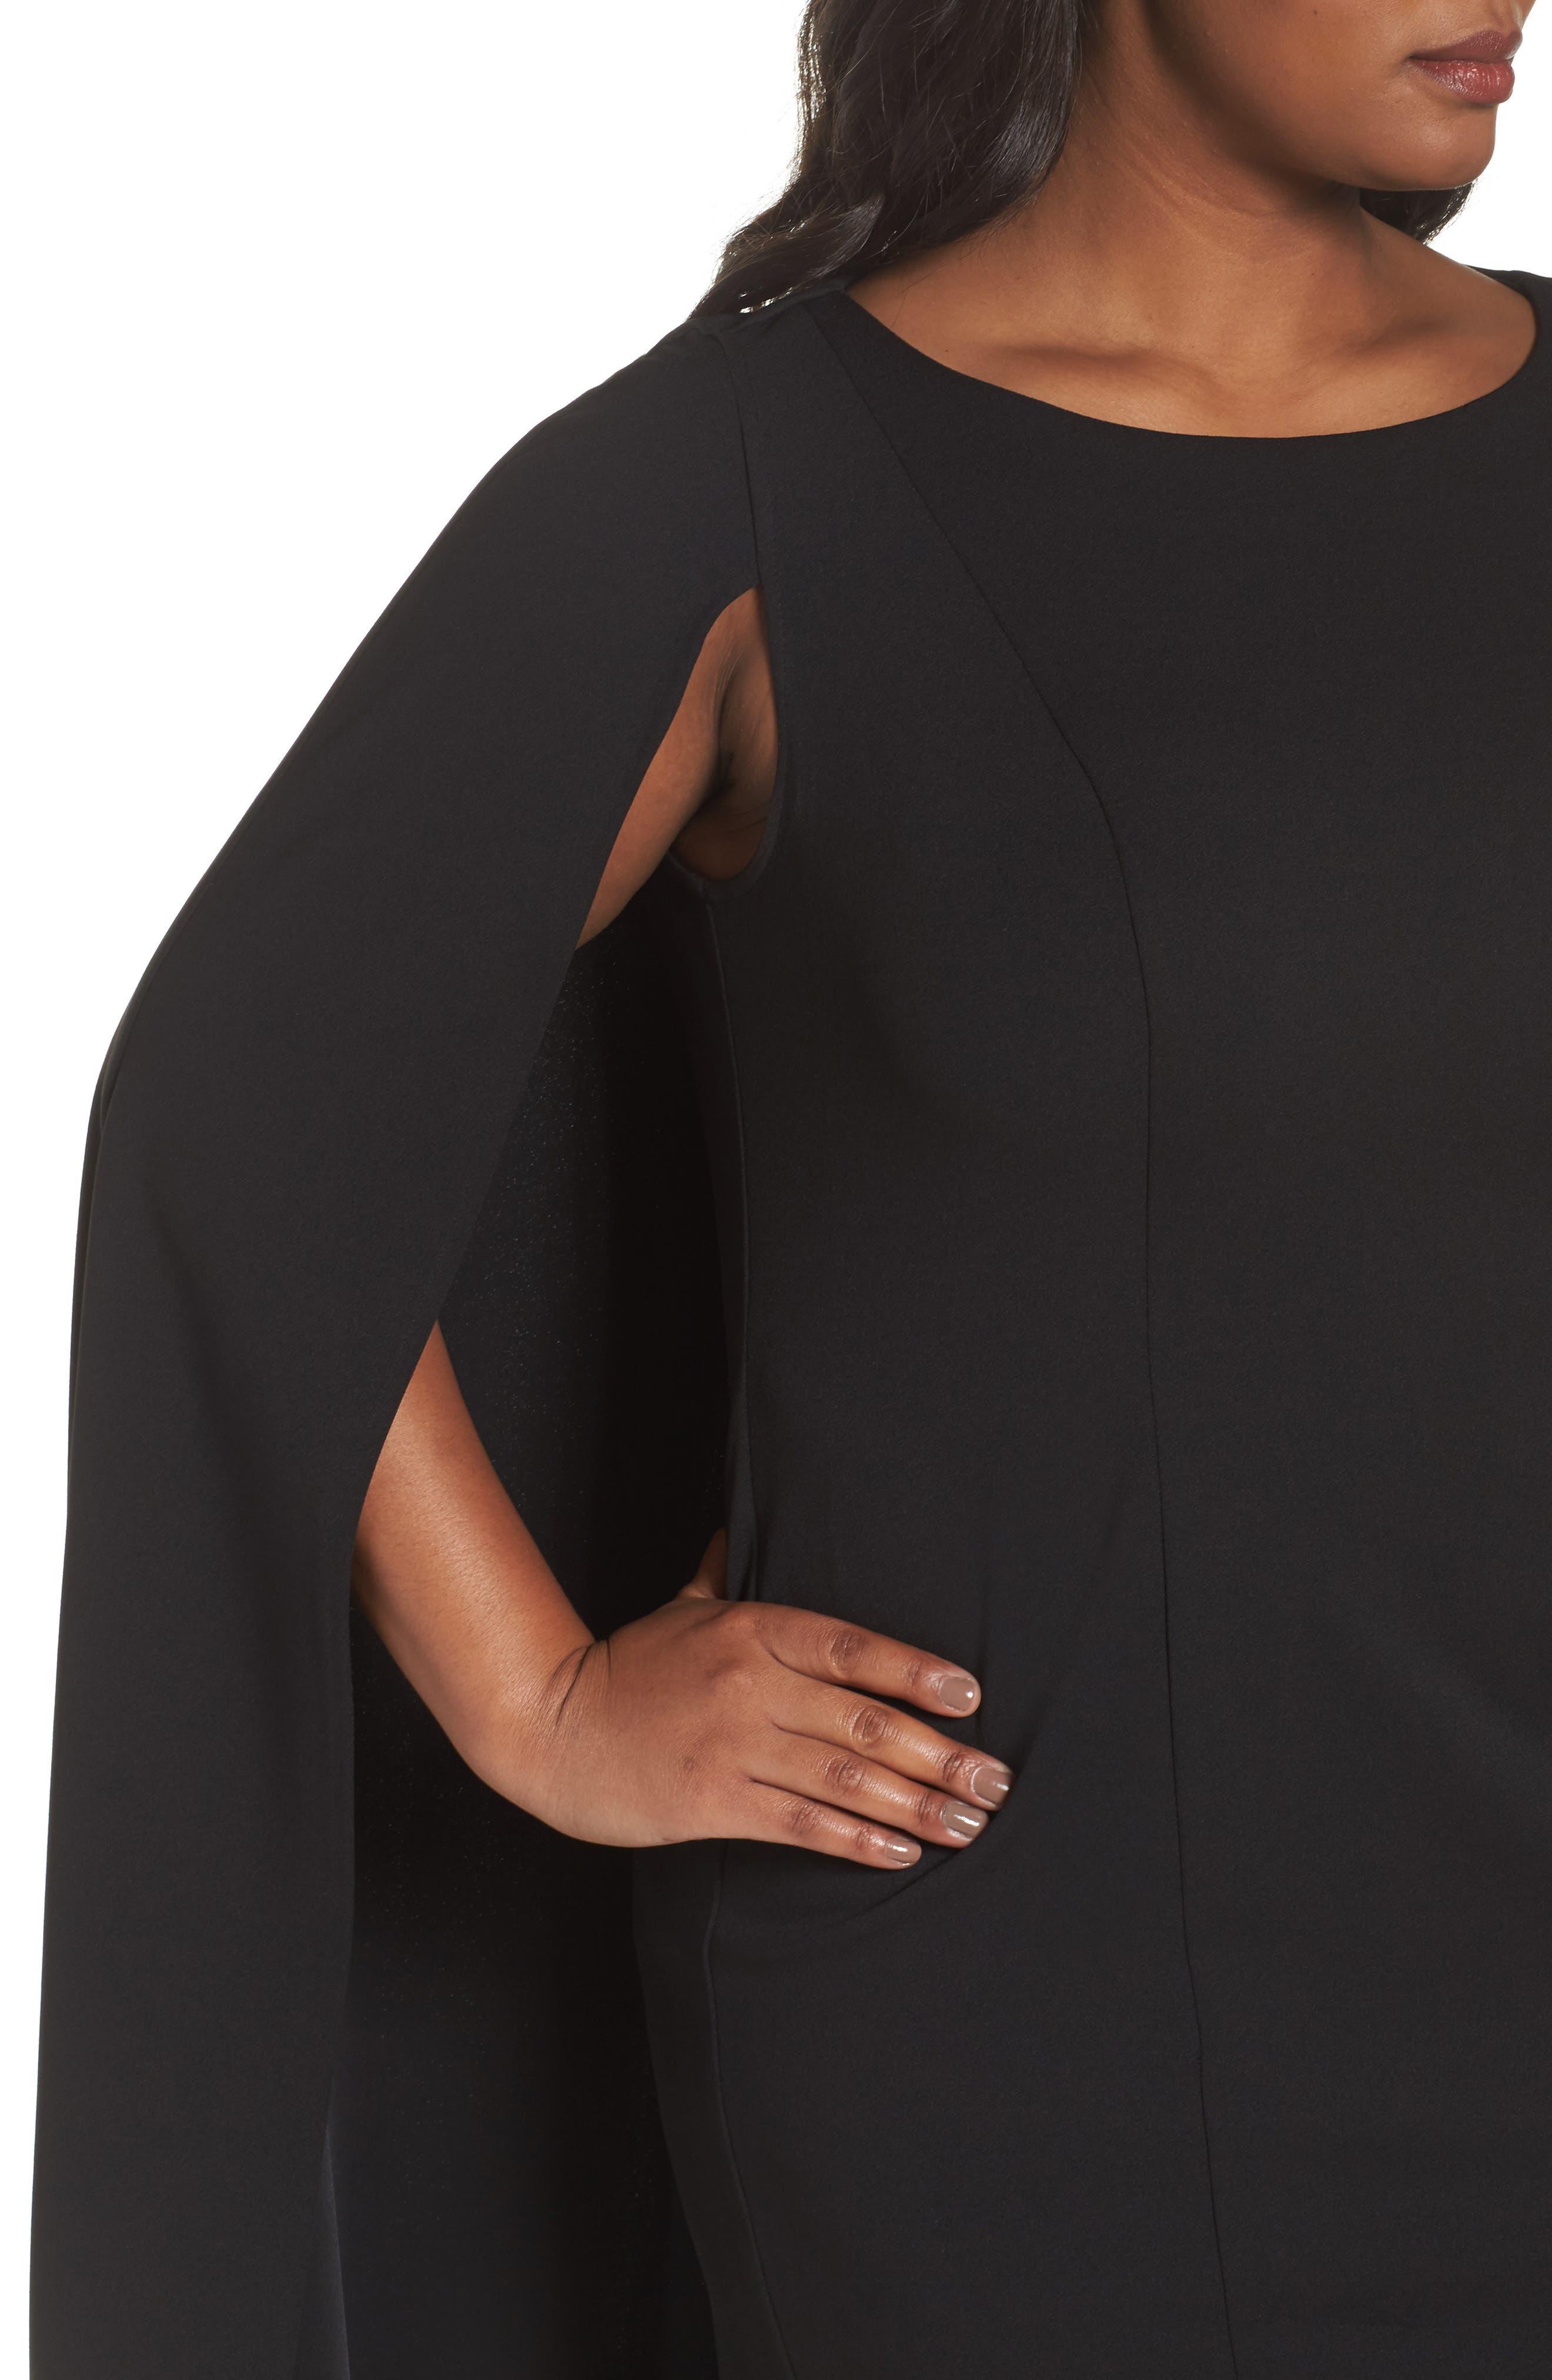 Alternate Image 4  - Adrianna Papell Cape Sheath Dress (Plus Size)